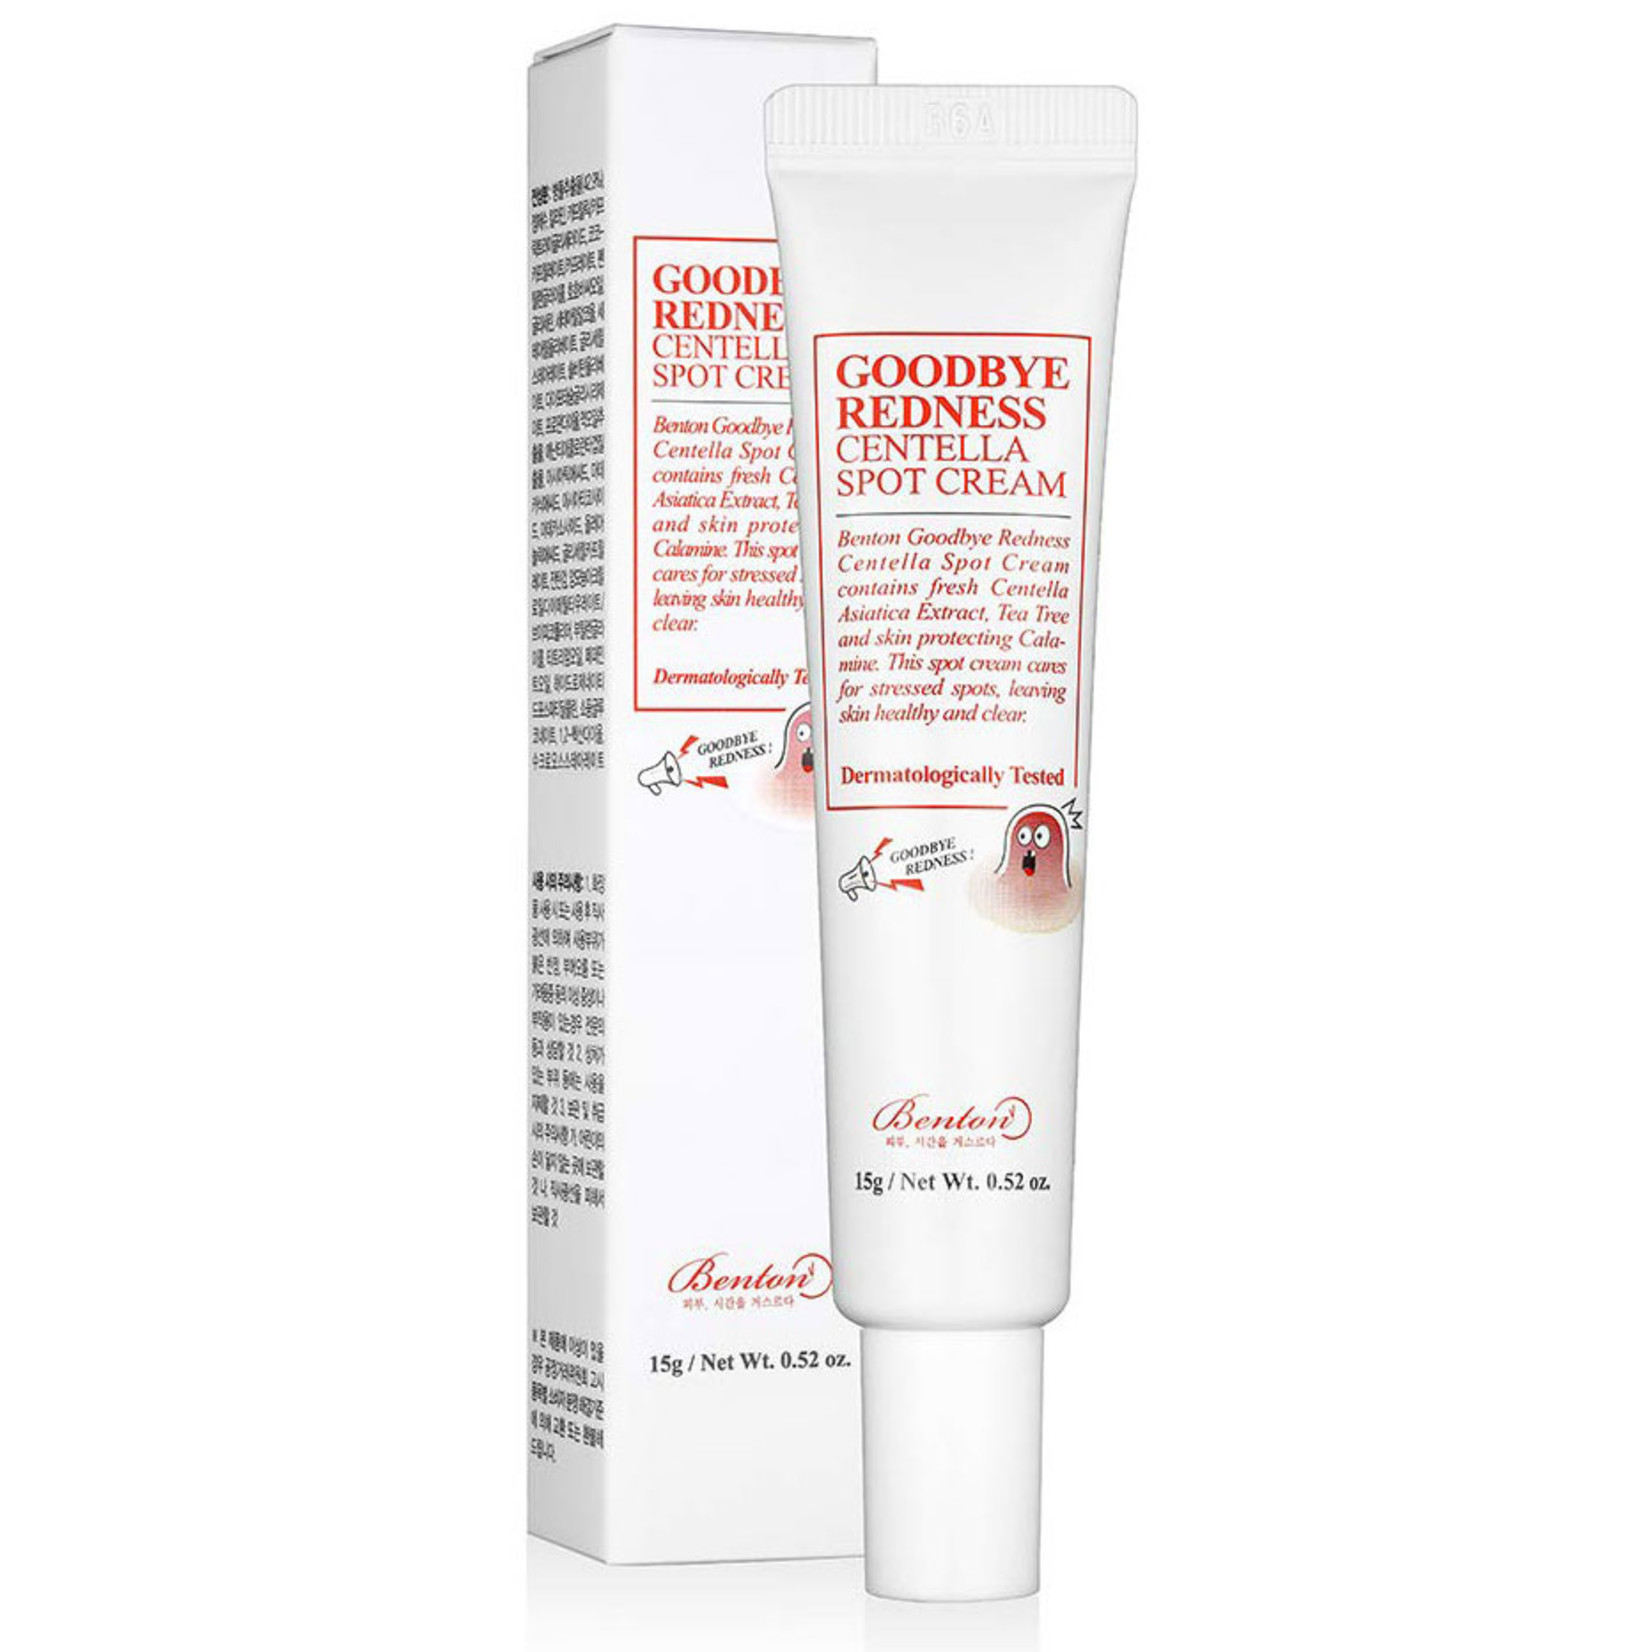 Benton Goodbye Redness Centella Spot Cream